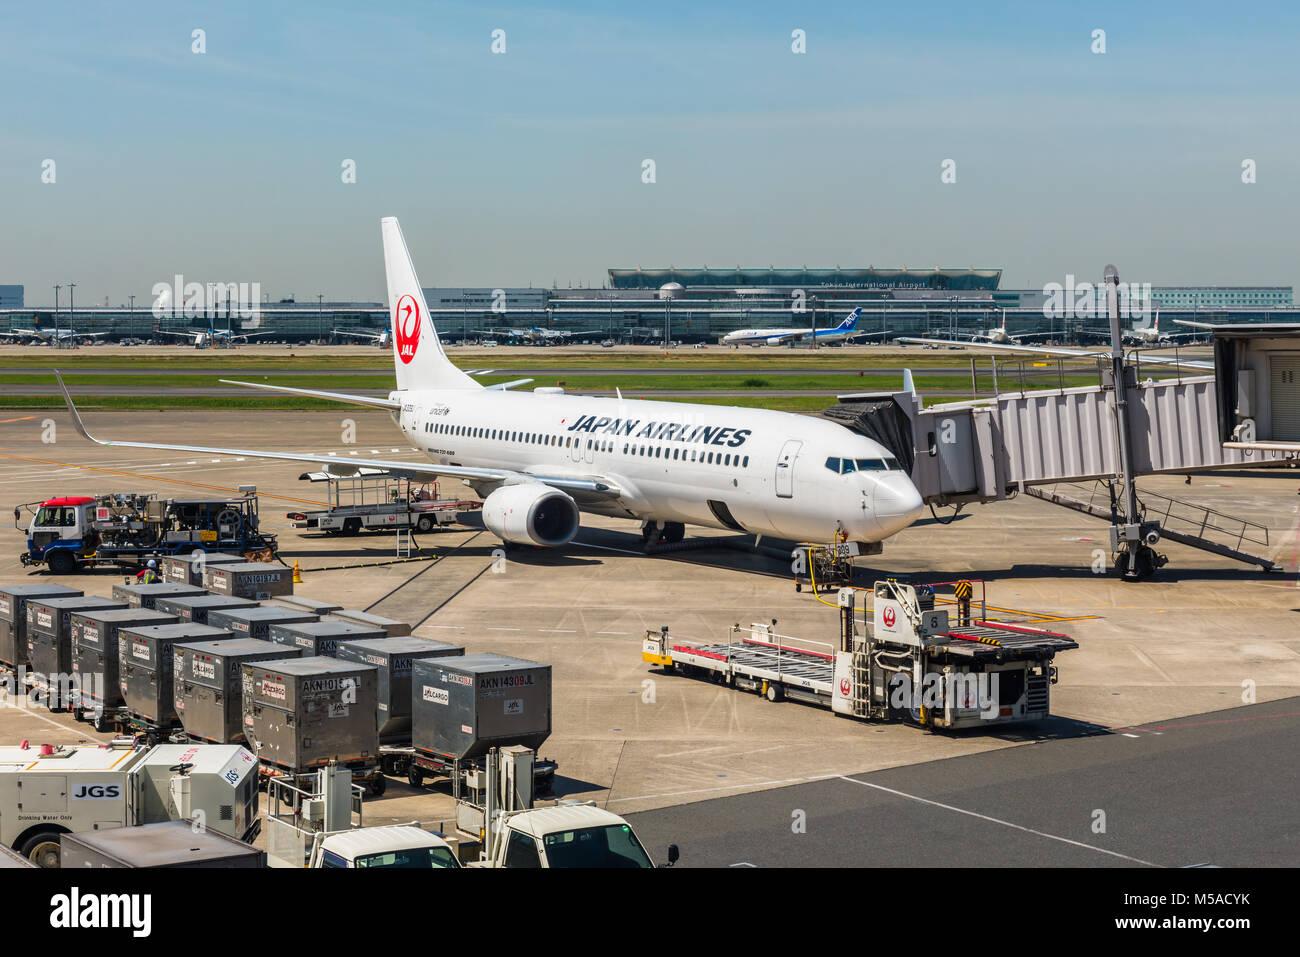 Aeroporto Tokyo : Japan air lines boeing oo ja j no aeroporto de haneda